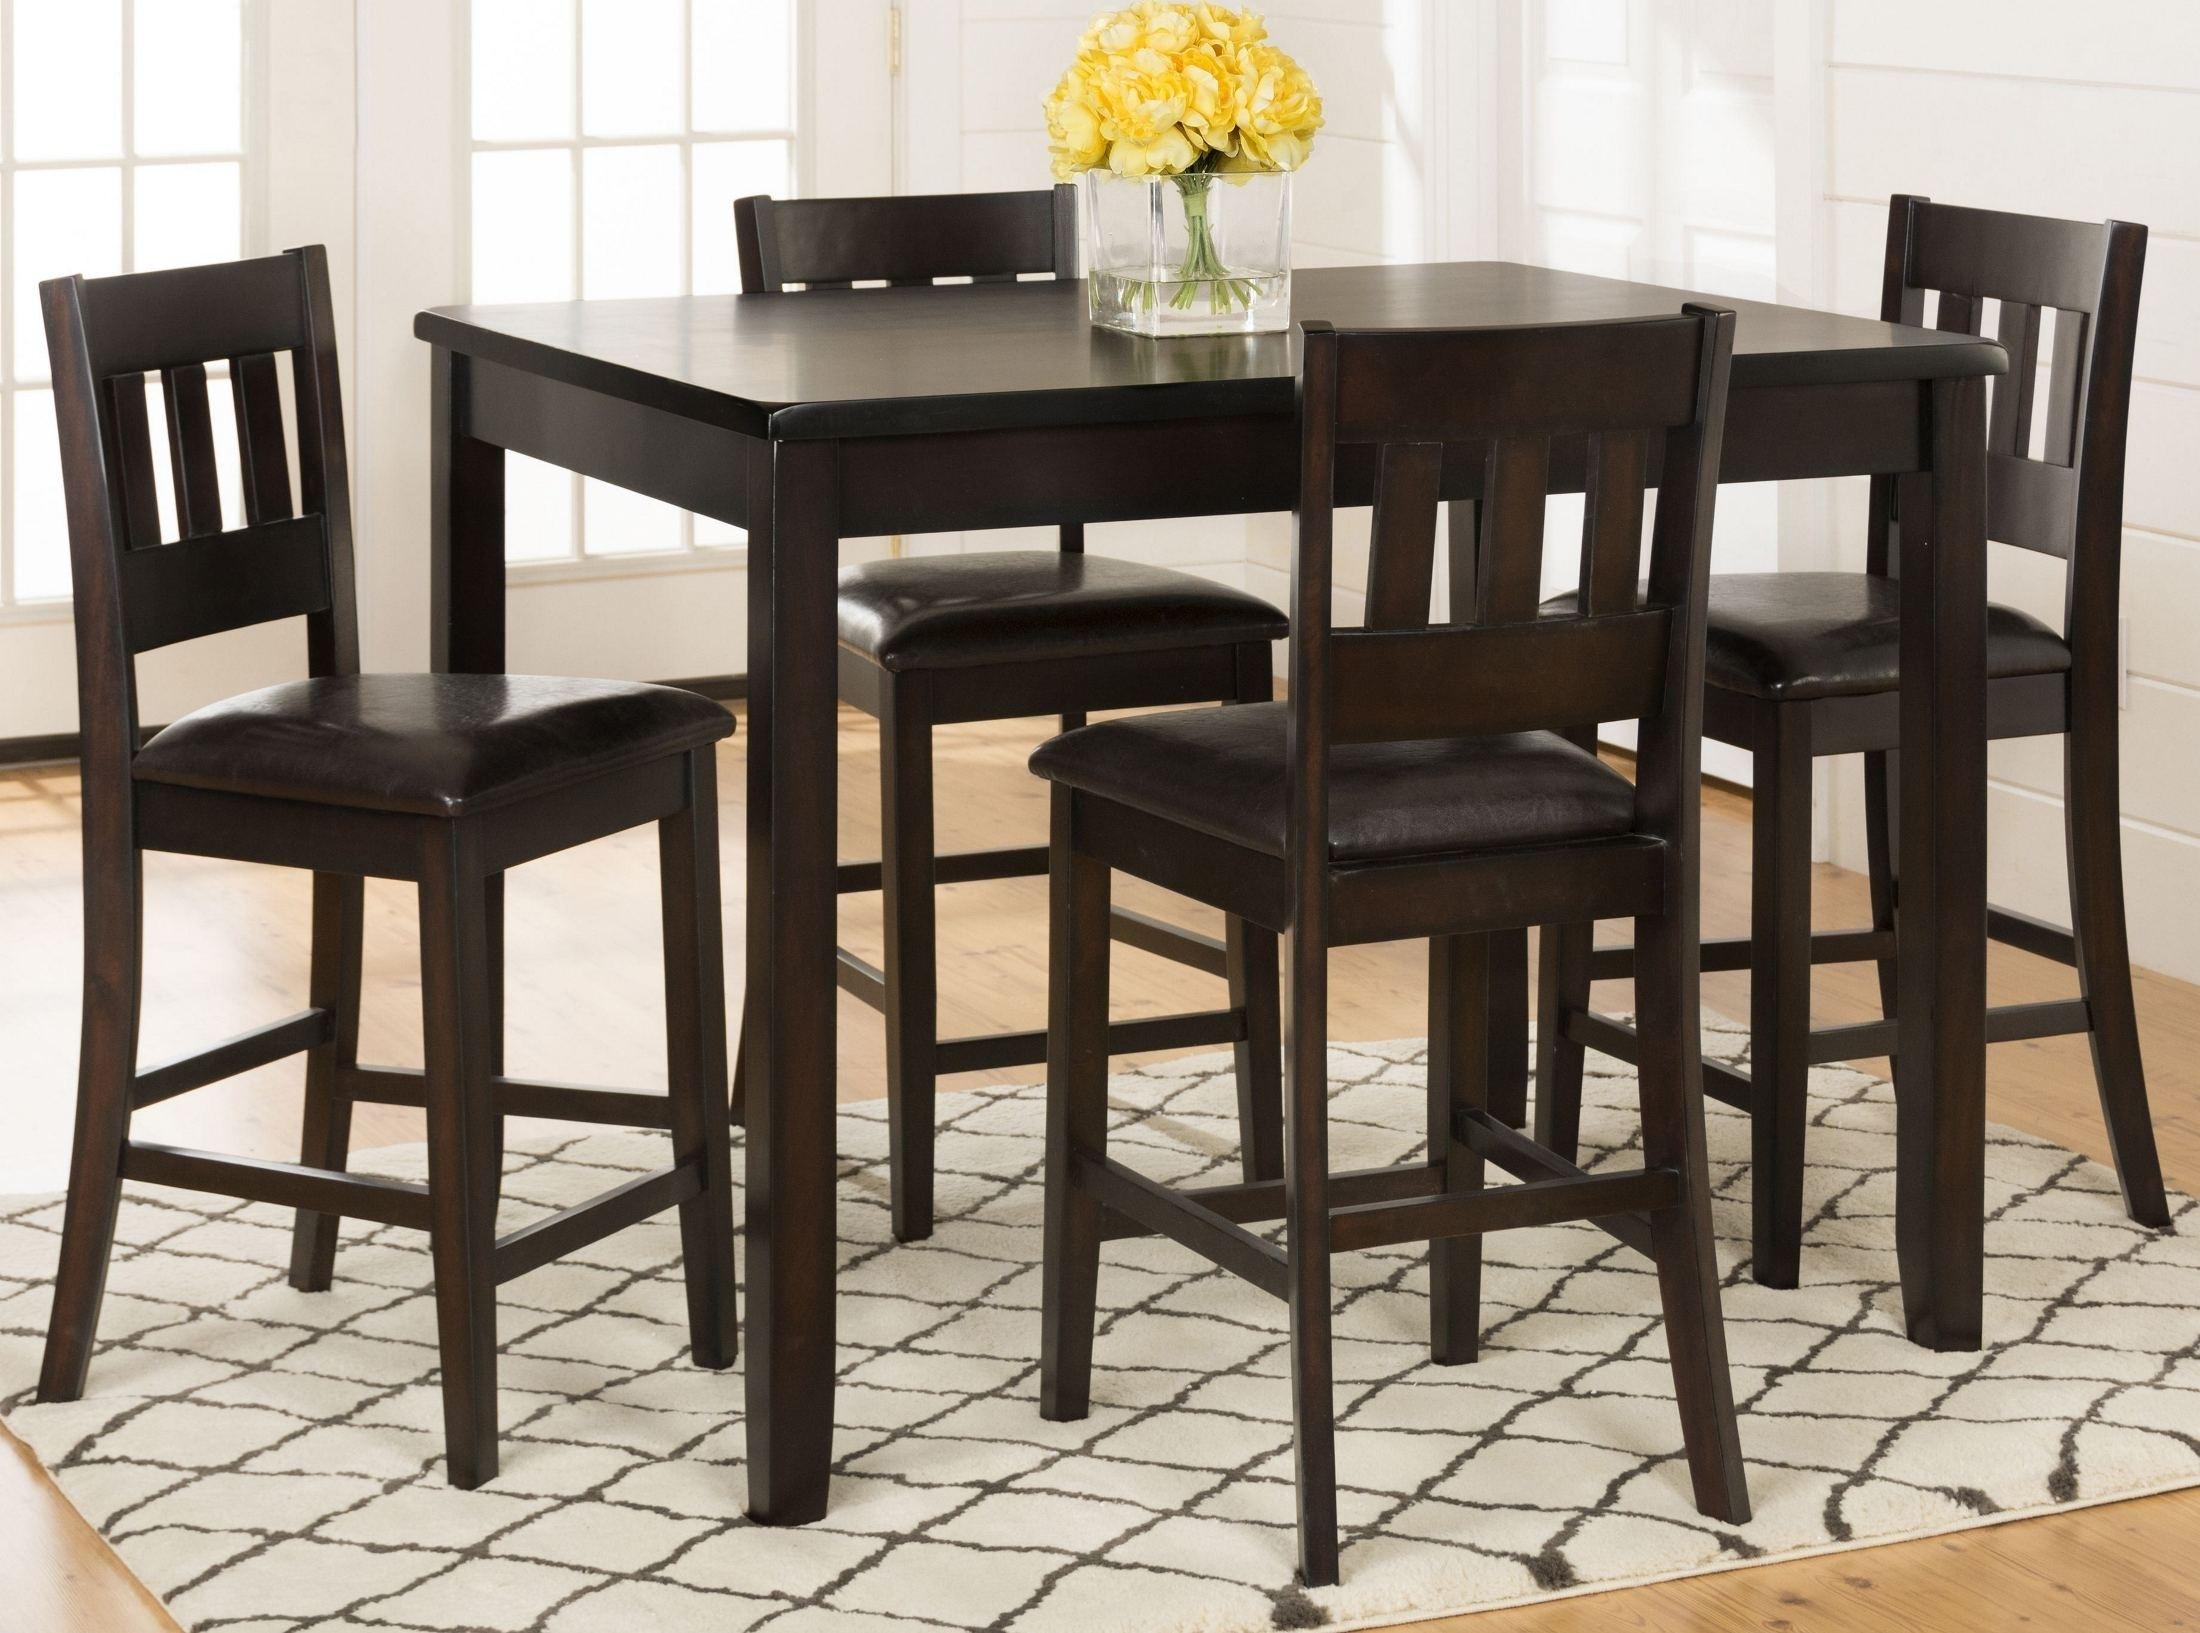 Dark Rustic Prairie Dark Brown 5 Piece Counter Height Dining Room Regarding Most Recent Harper 5 Piece Counter Sets (Image 6 of 20)